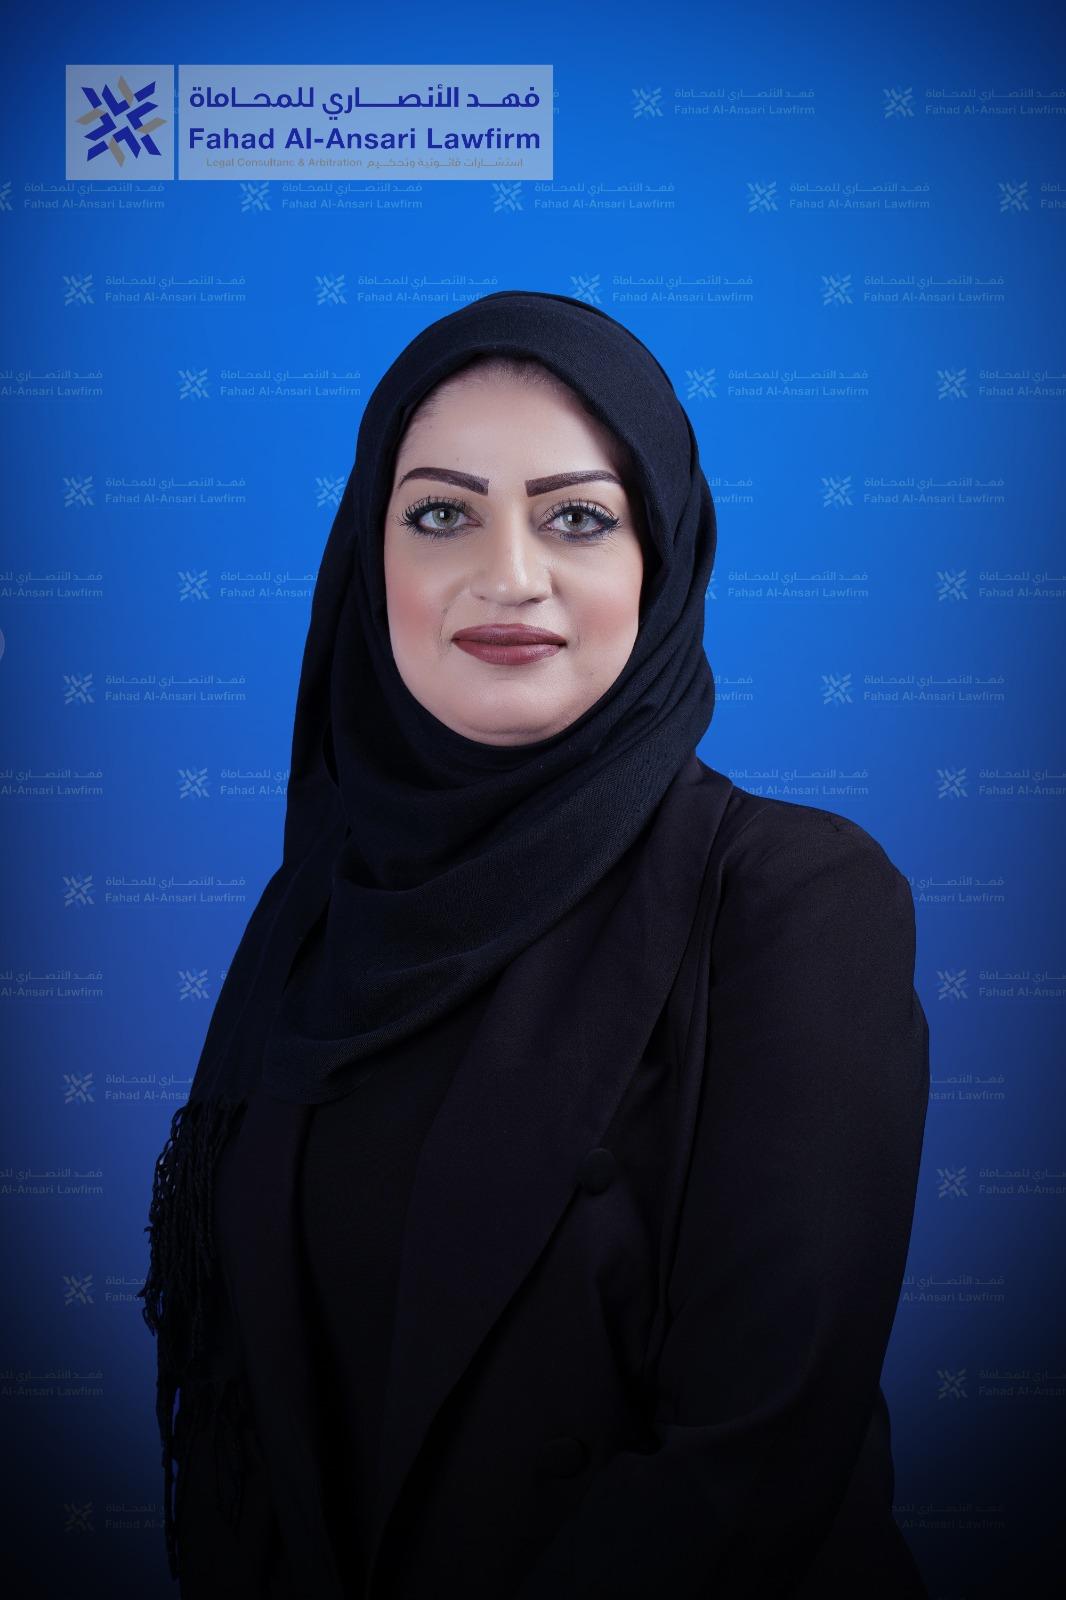 Hadeel Haitham Al Attar